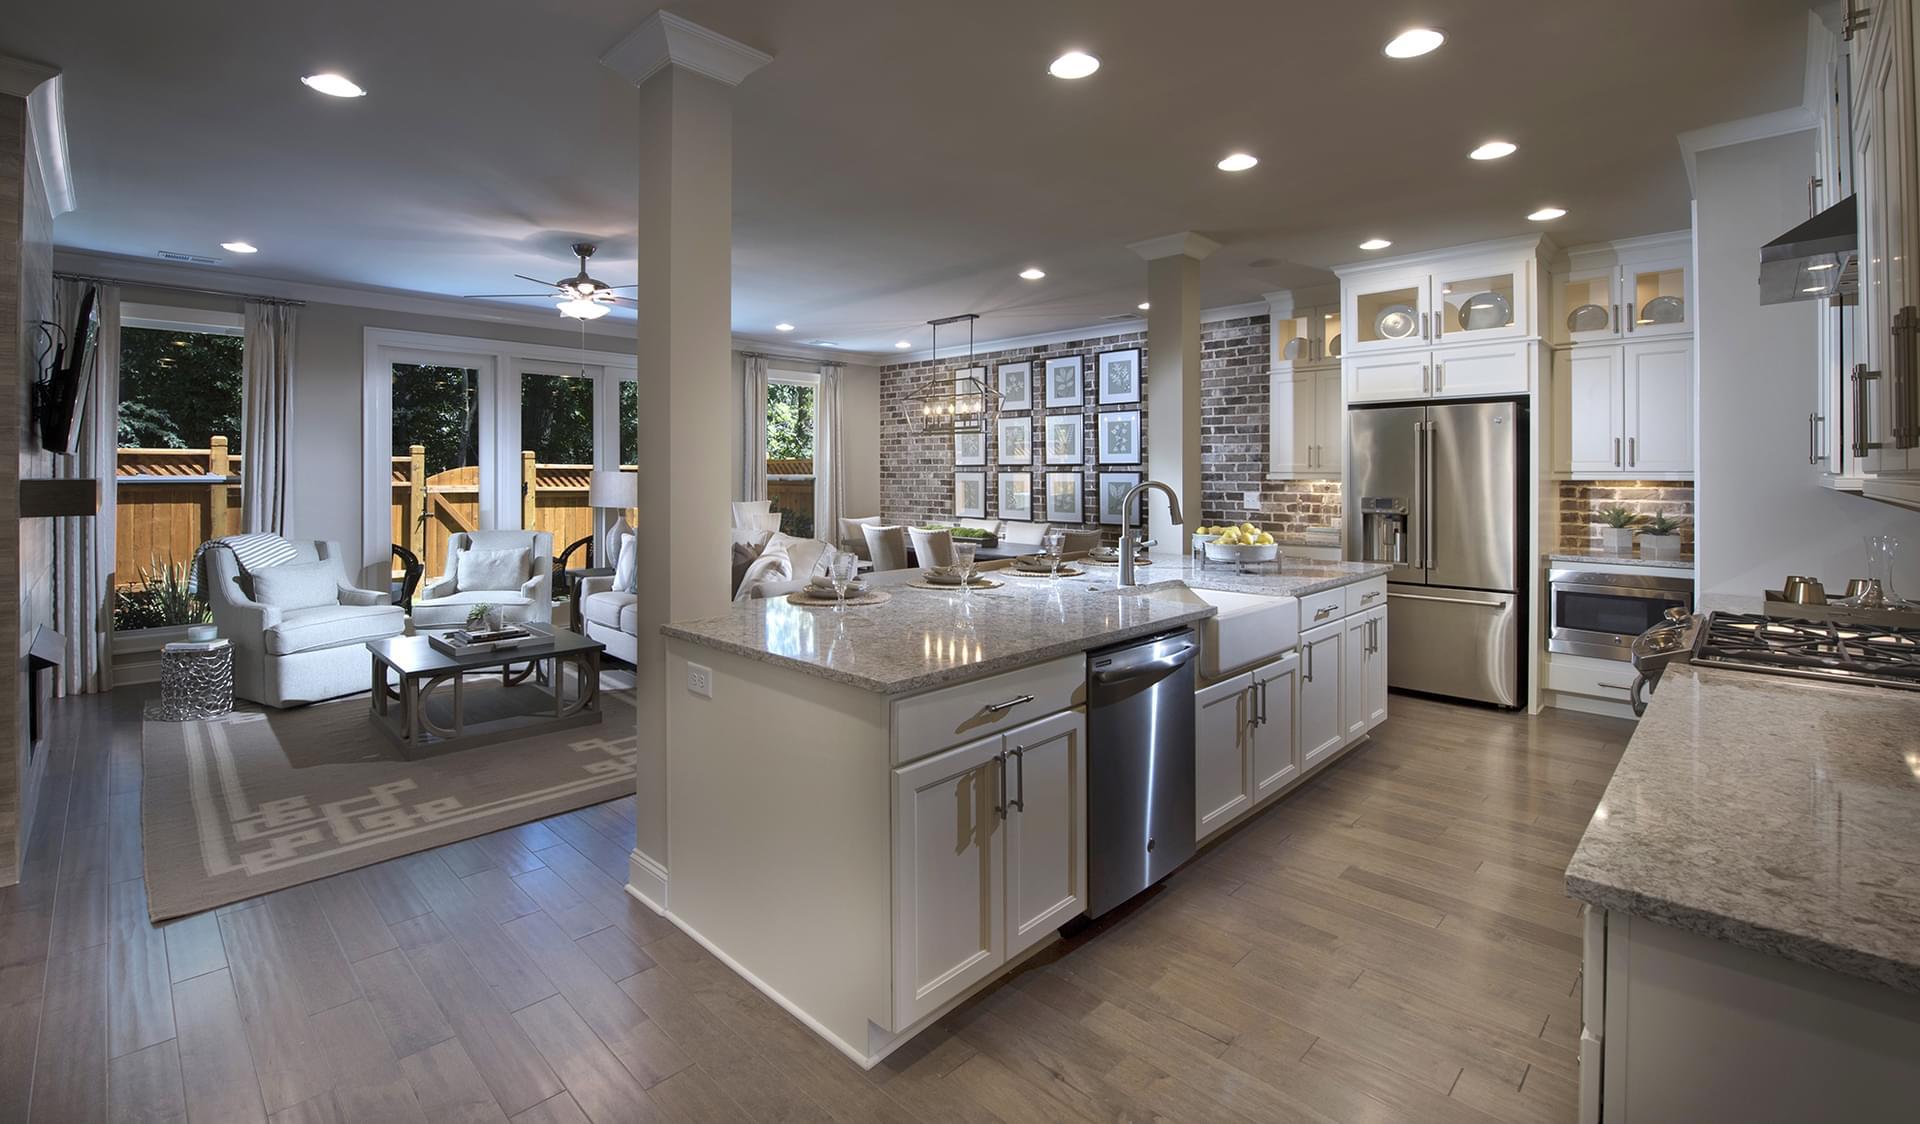 The Braxton II New Home in Duluth GA